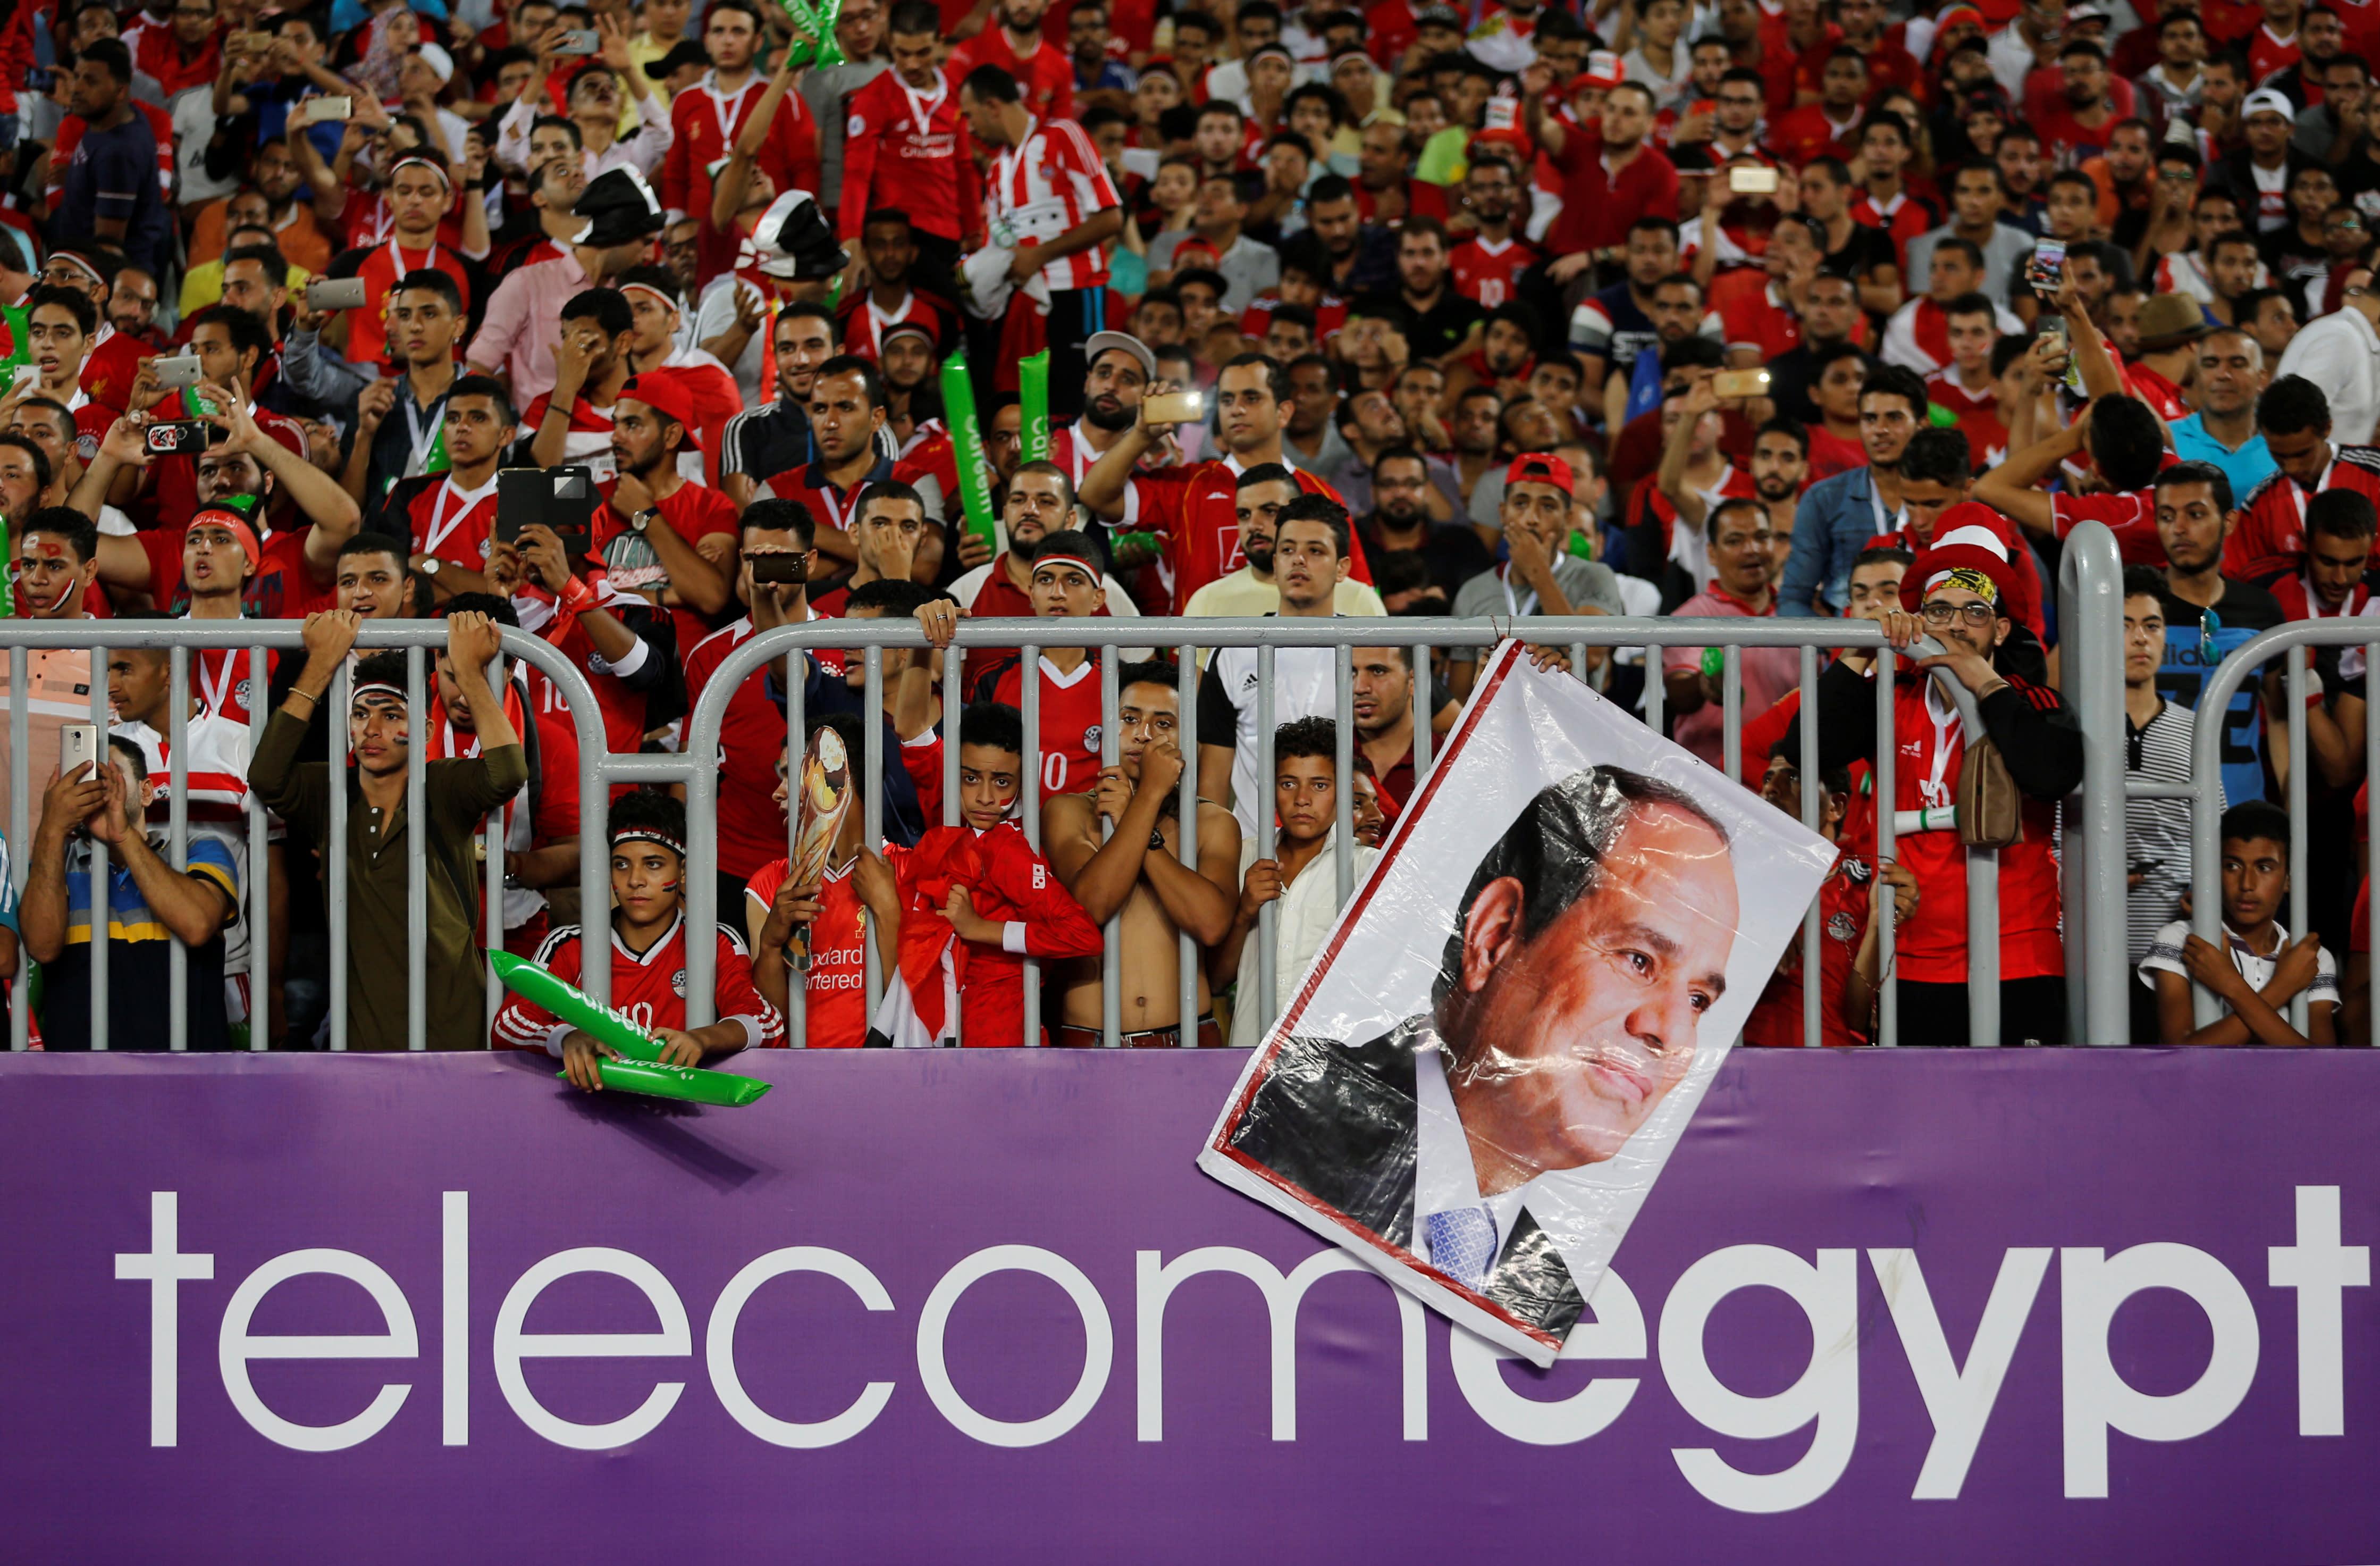 Egyptian soccer fans at Borg El Arab Stadium, Alexandria, Egypt, October 8, 2017 (Reuters)